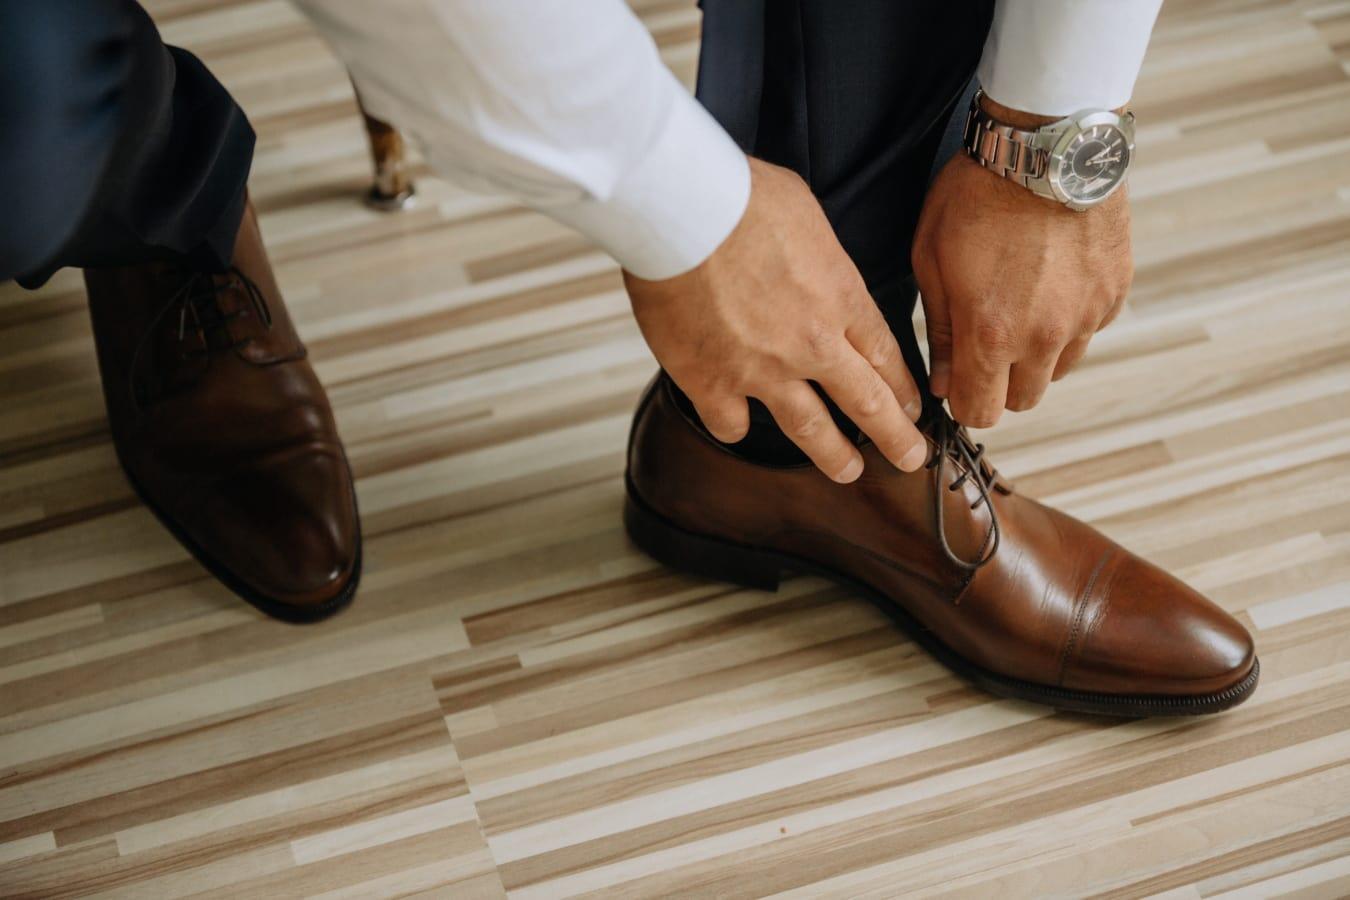 Leder, hellbraun, Schuhe, Hände, Mann, gut aussehend, Beine, beiläufig, Mode, Schuhe